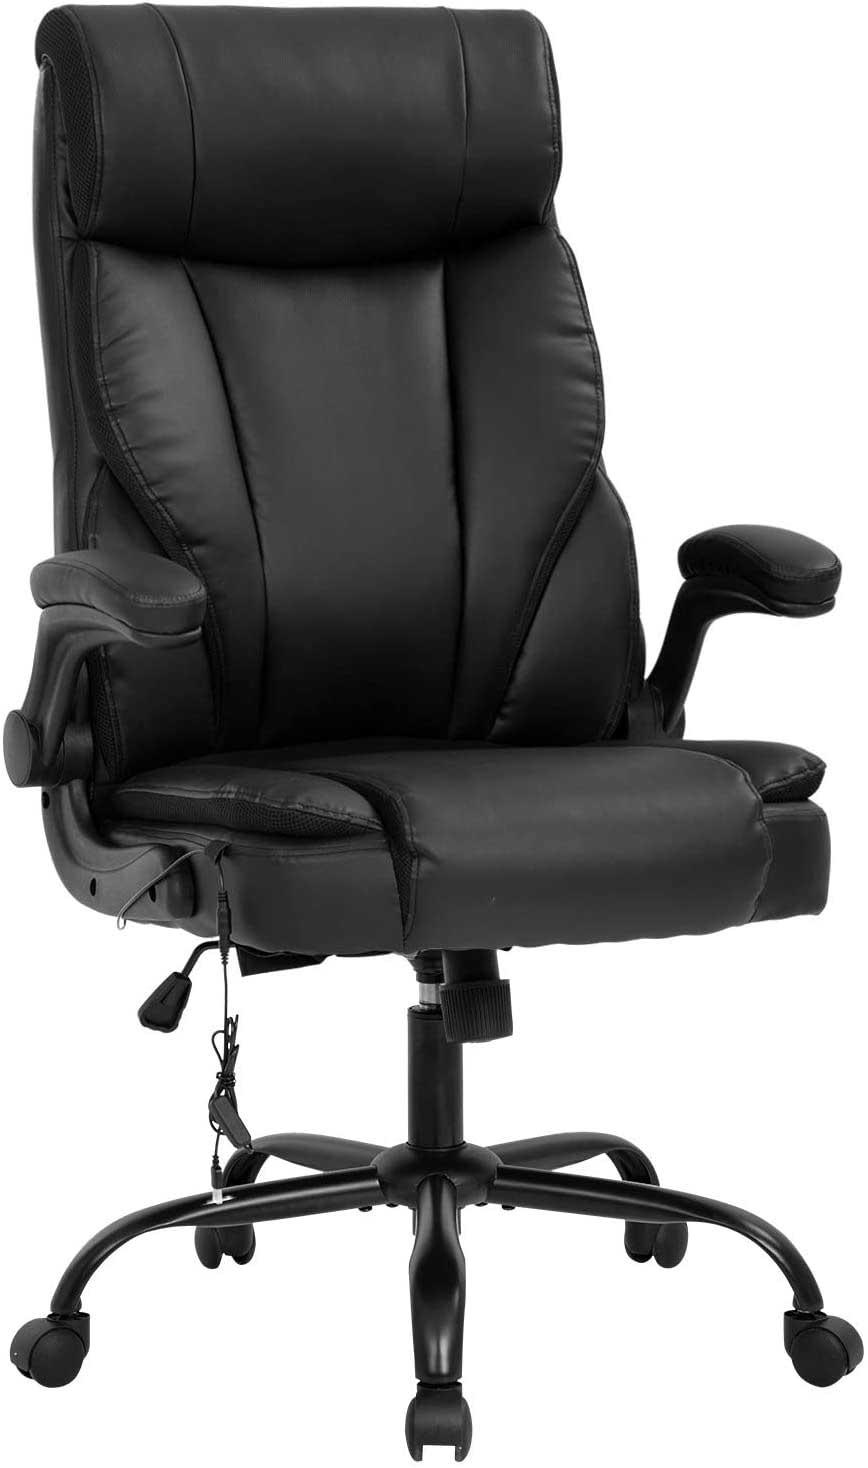 2.-Ergonomic-Desk-Chair